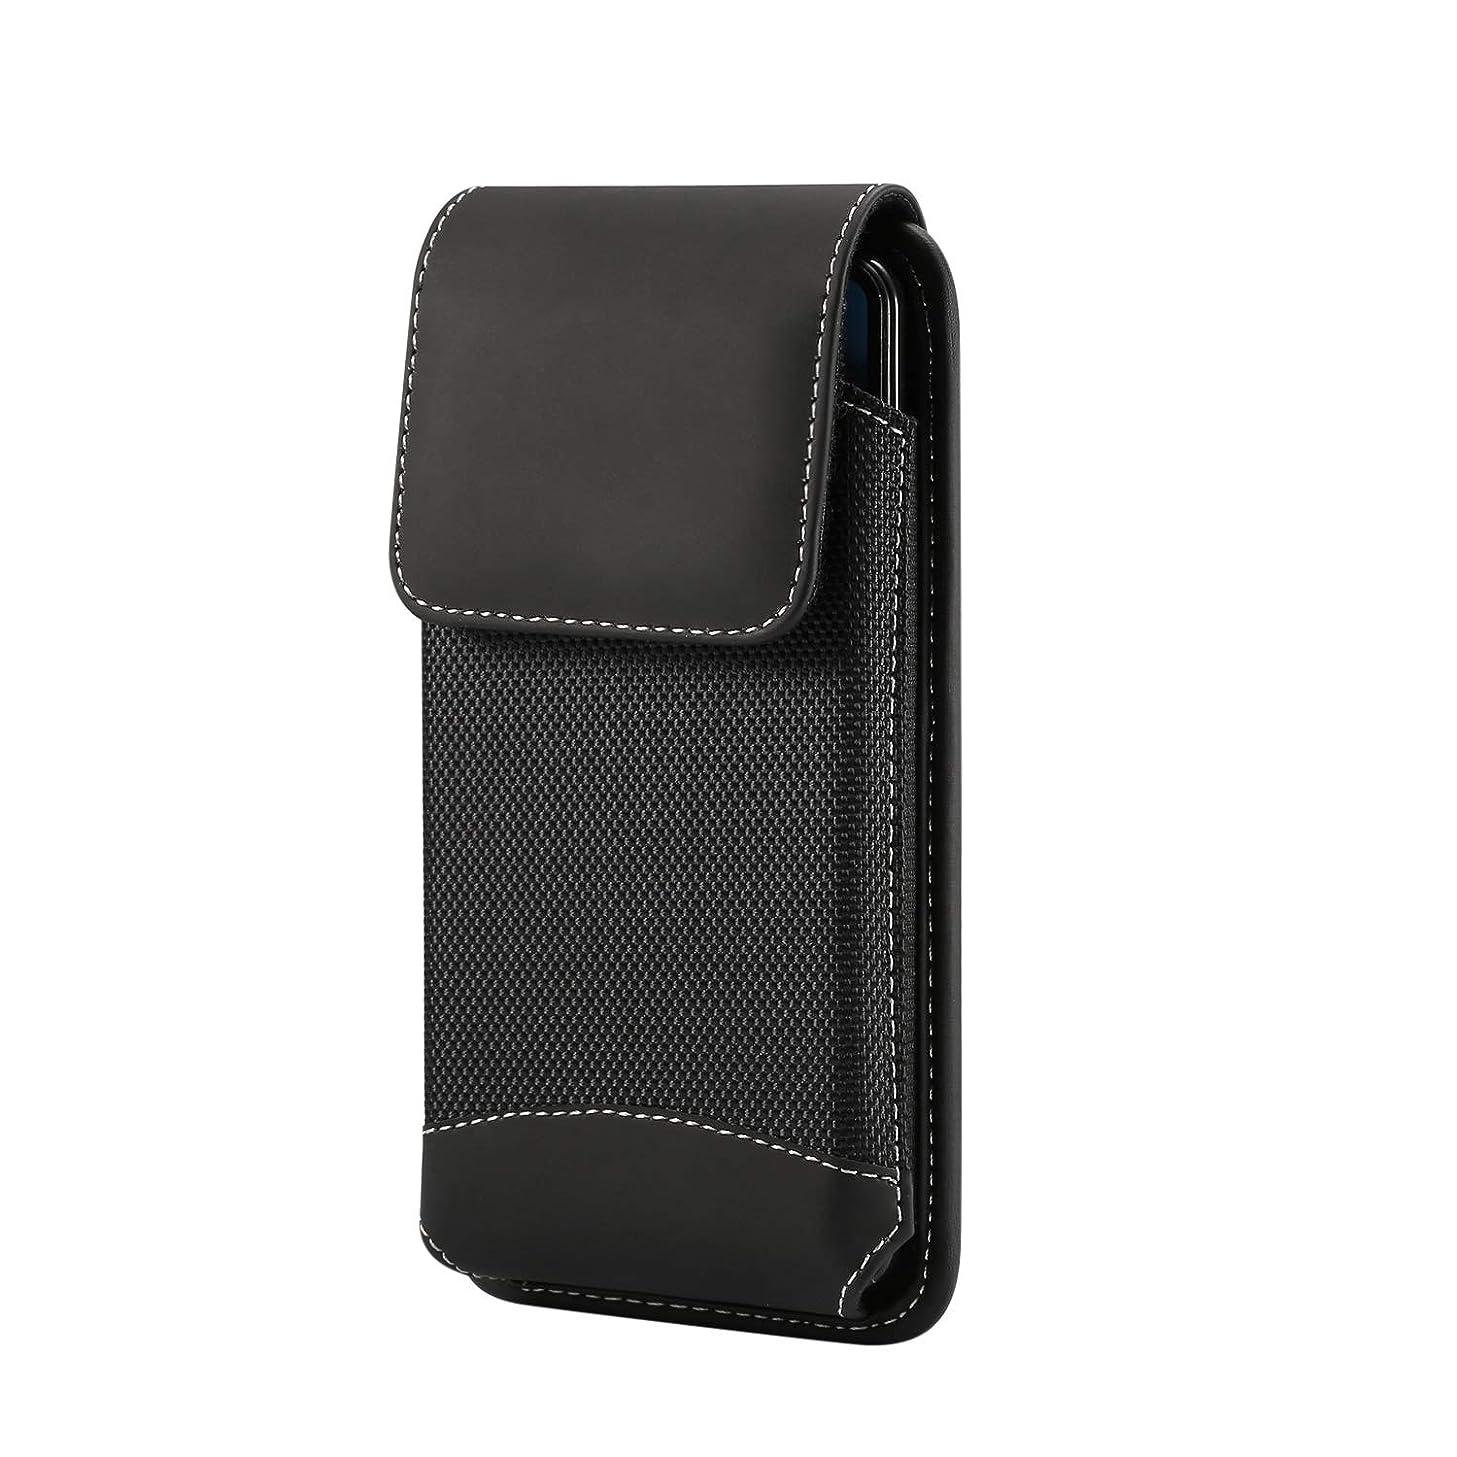 Men Oxford Vertical Pouch Case Belt Clip Loops Holster for LG G7 G6 / LG Stylo 4 / Stylo 3 / LG V40 ThinQ/LG K30 / Motorola Moto G6 Play / G6 Plus / E5 Plus / Z3 Play/OnePlus 6T